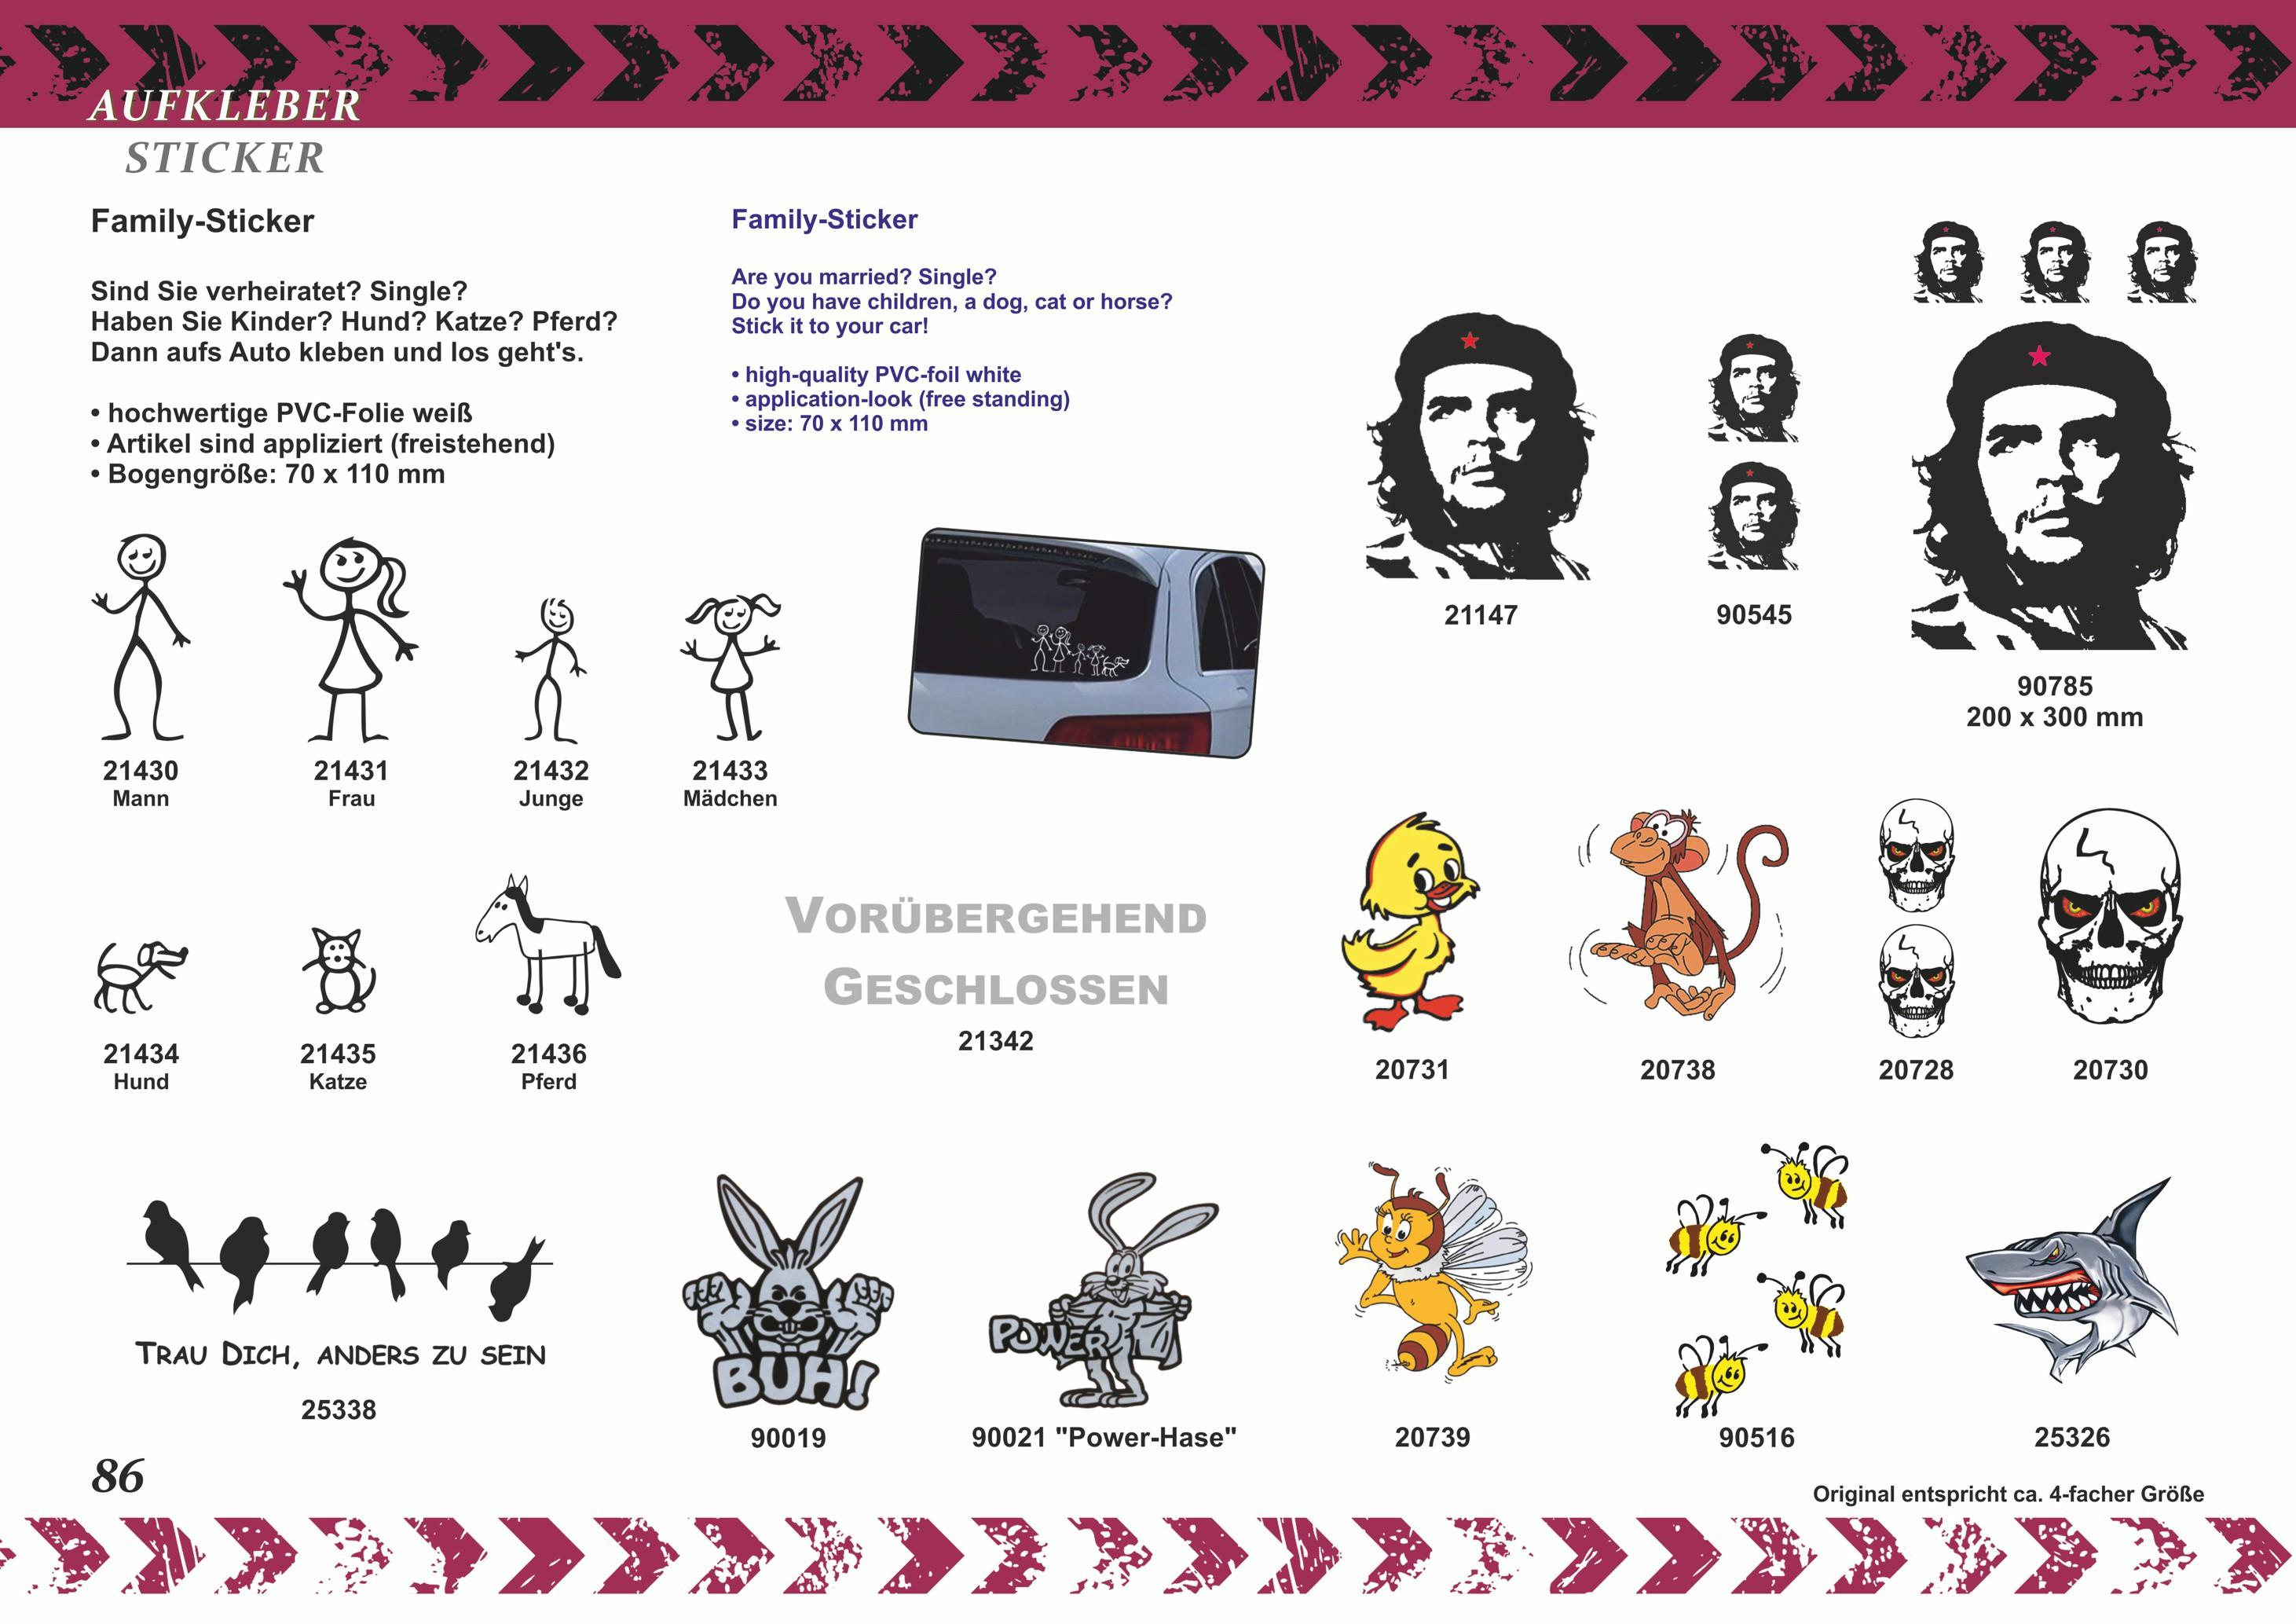 Family-Sticker garçon dessin au trait 70 x 35 mm appliqué – Bild 5